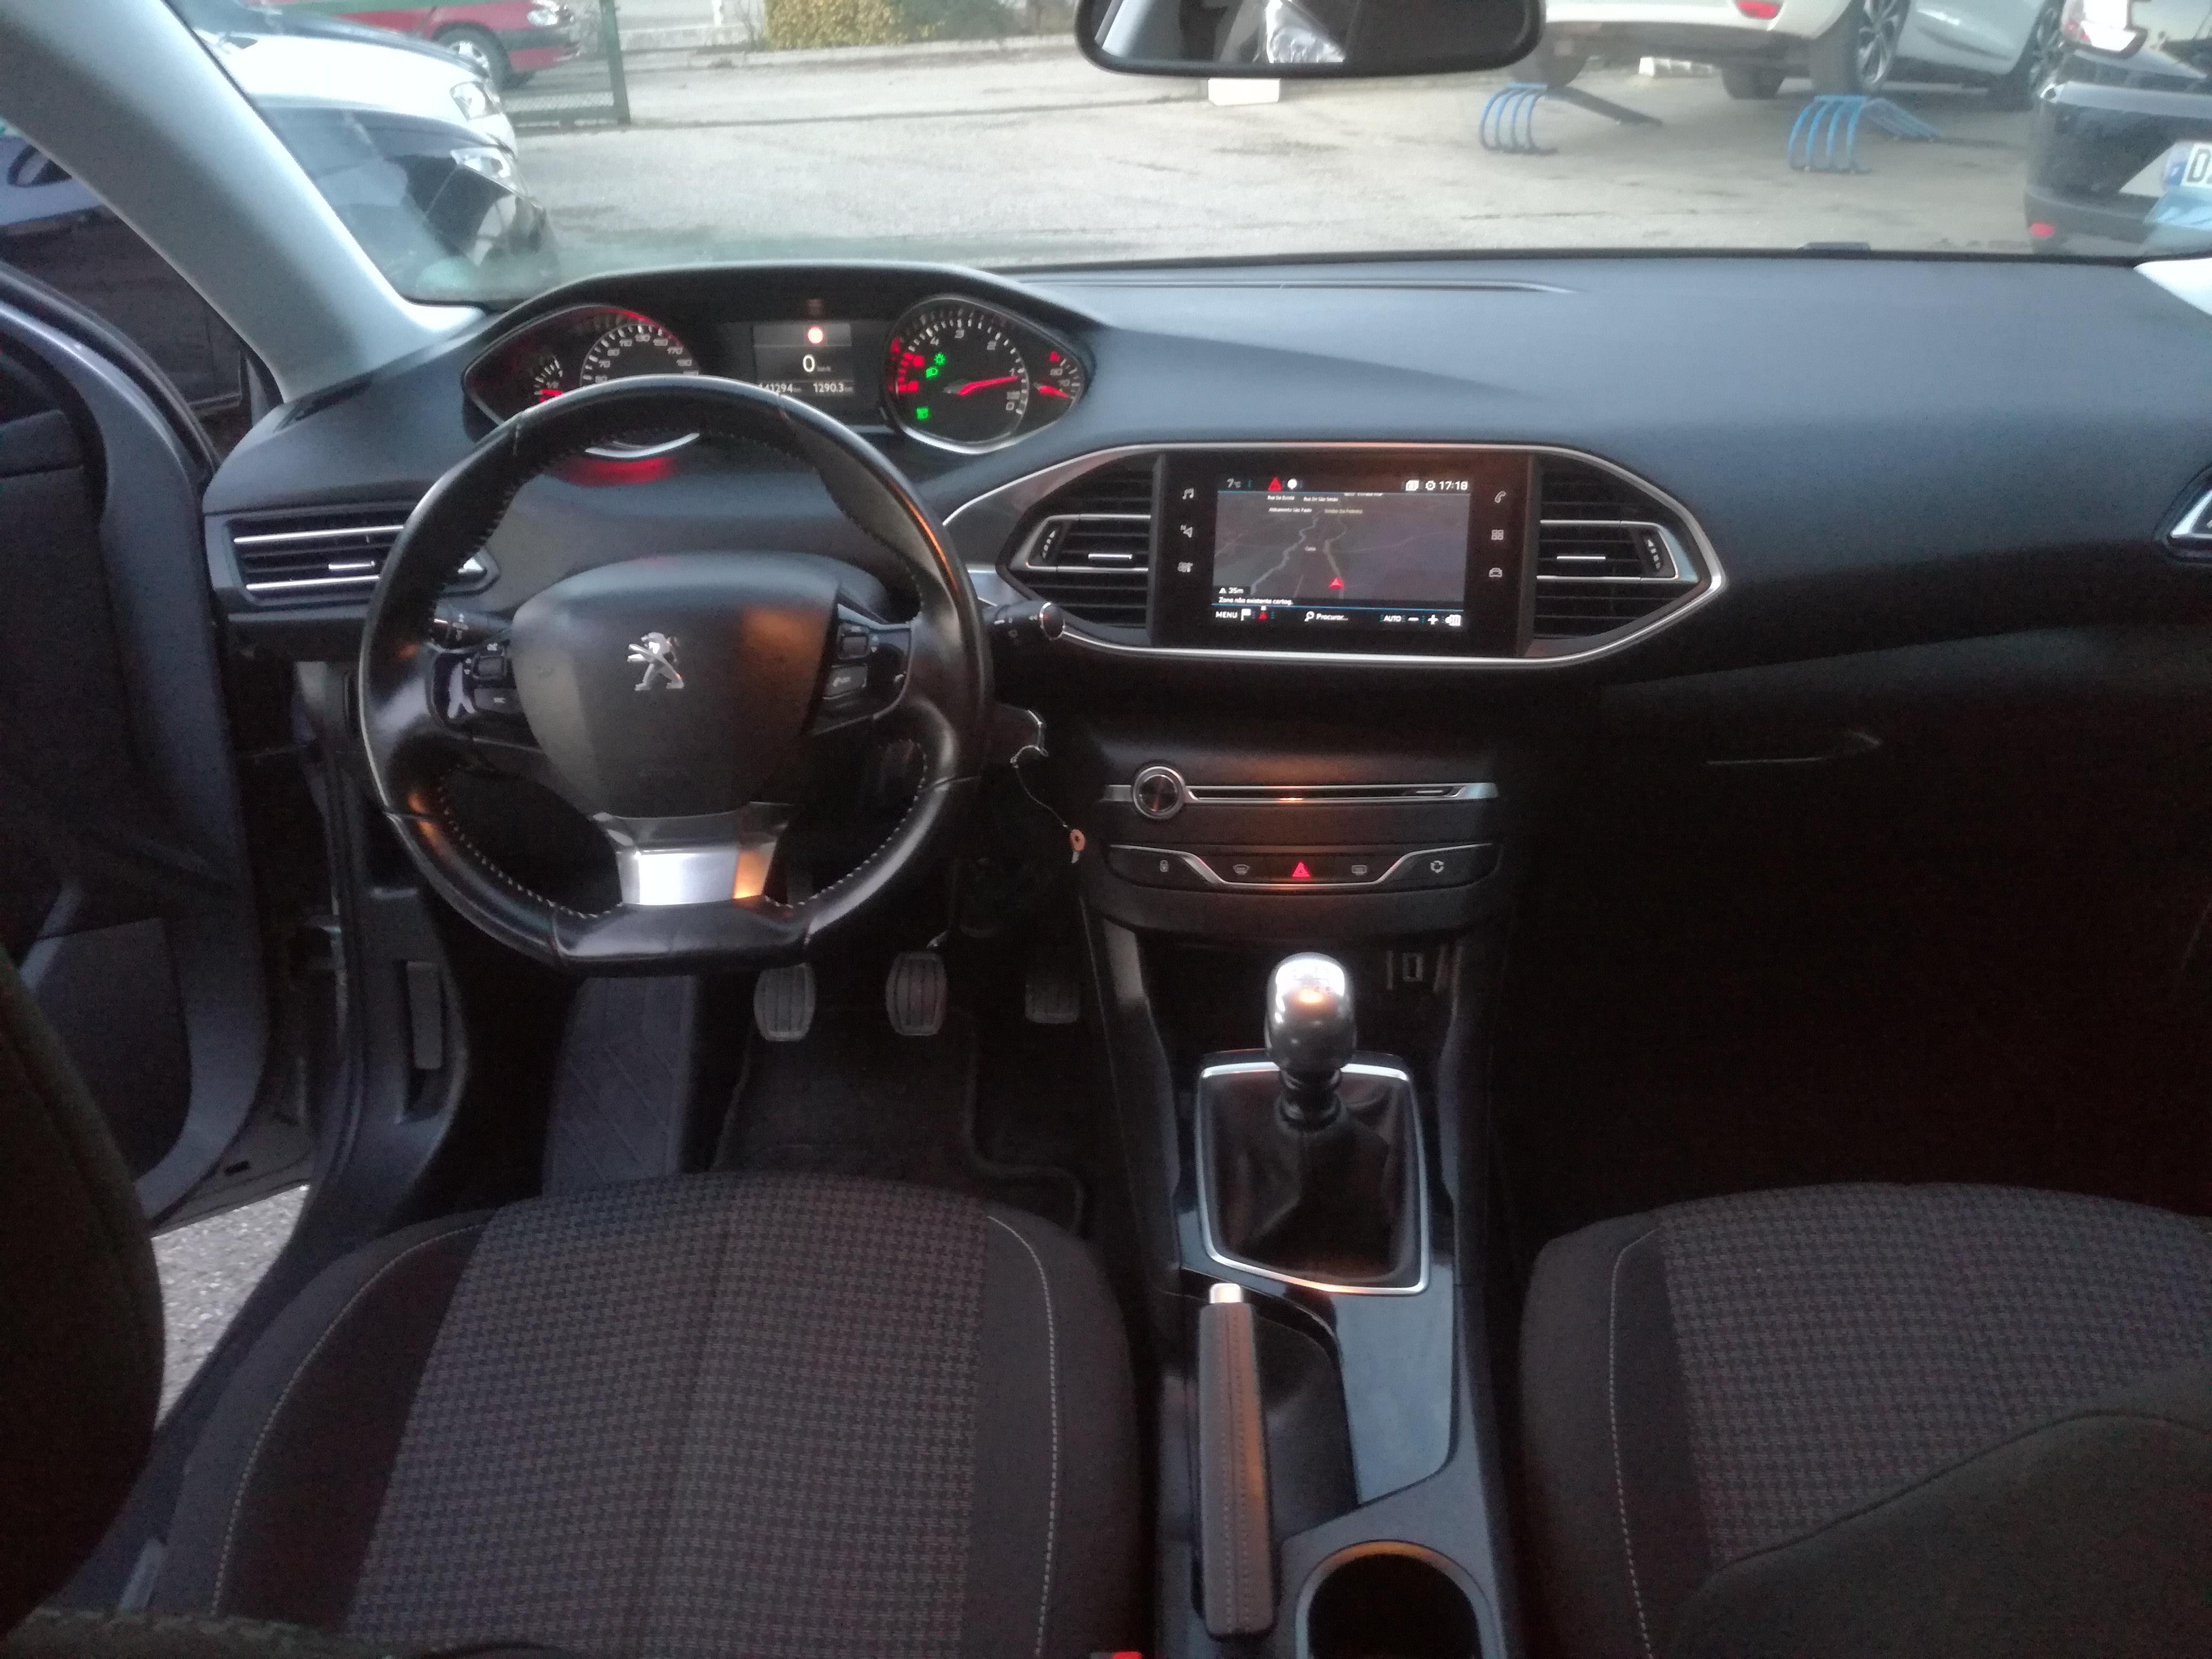 Peugeot 308 SW Active 1.6 HDI 120CV | Imagem 16